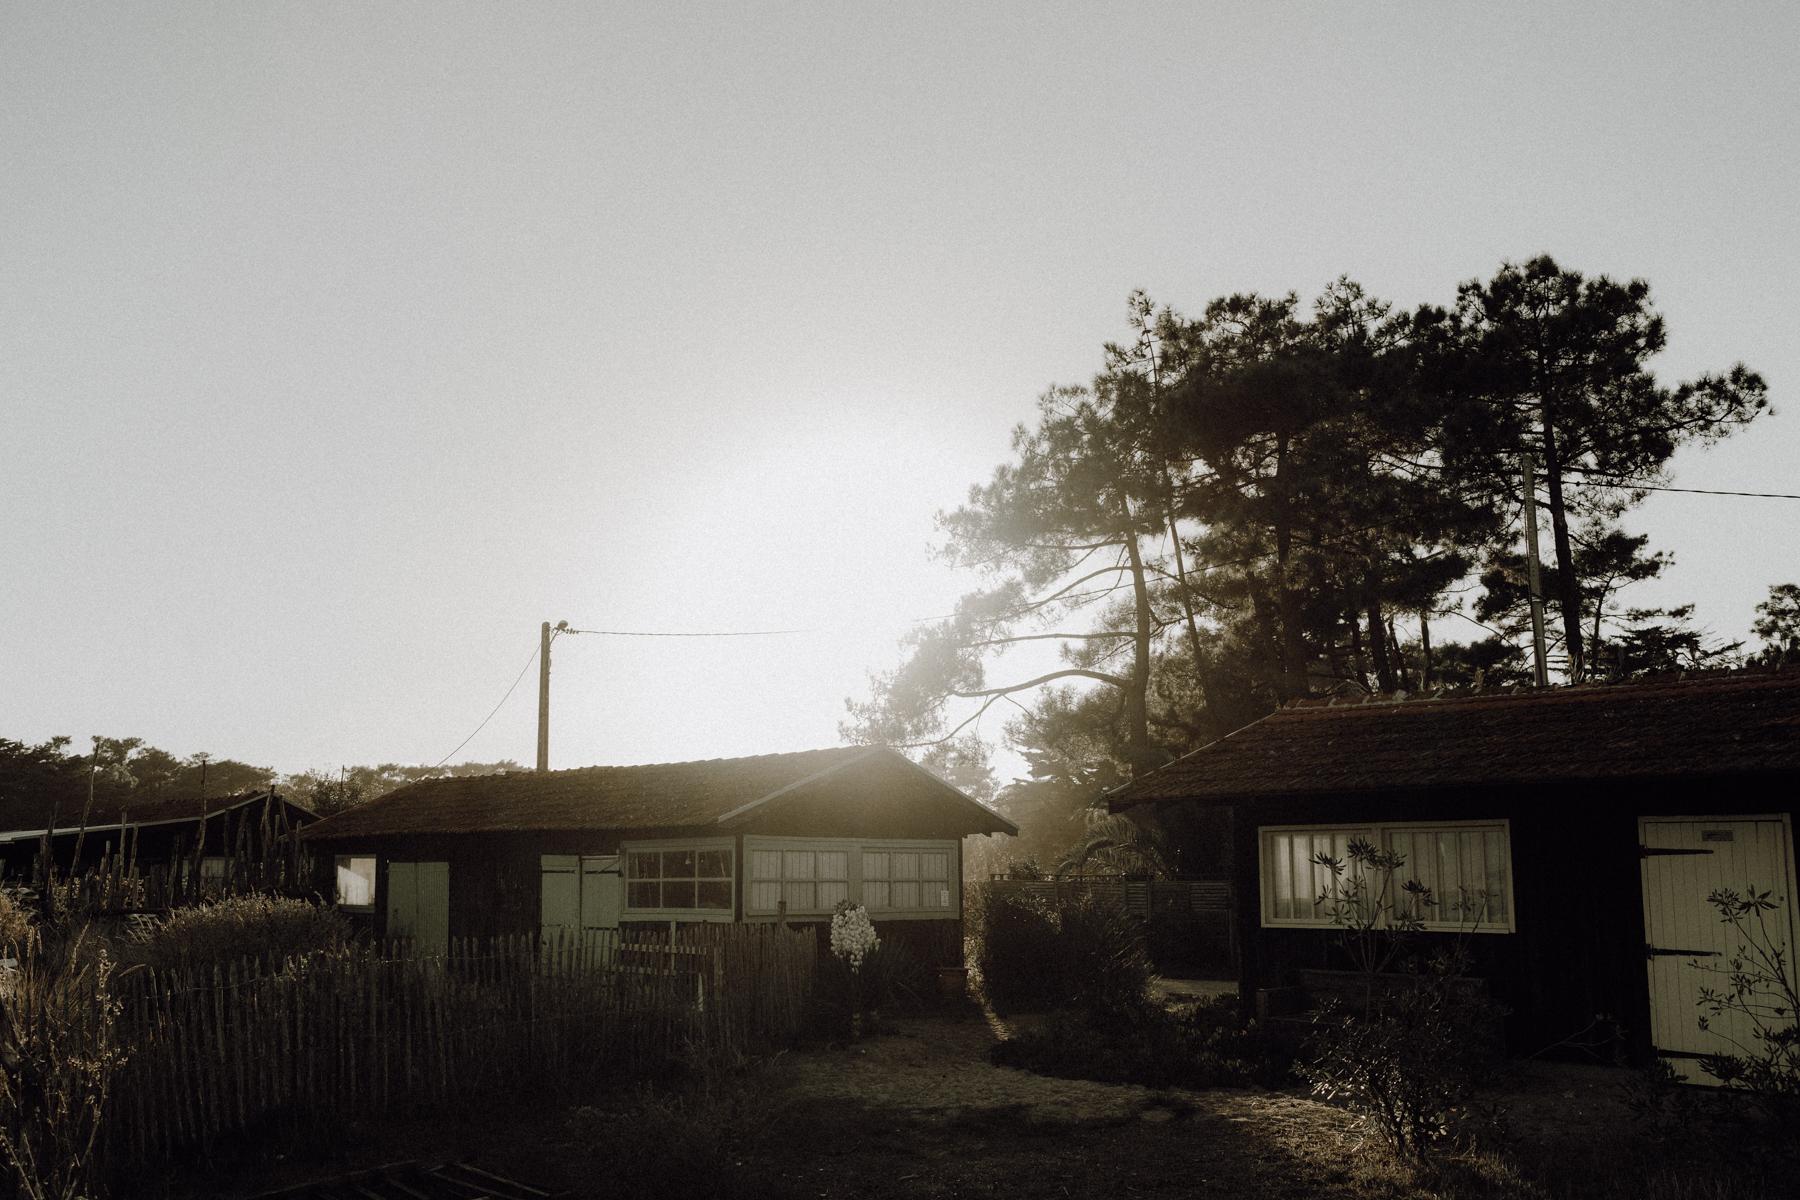 Photographer-Kewin-Connin-Jackson -03913.jpg